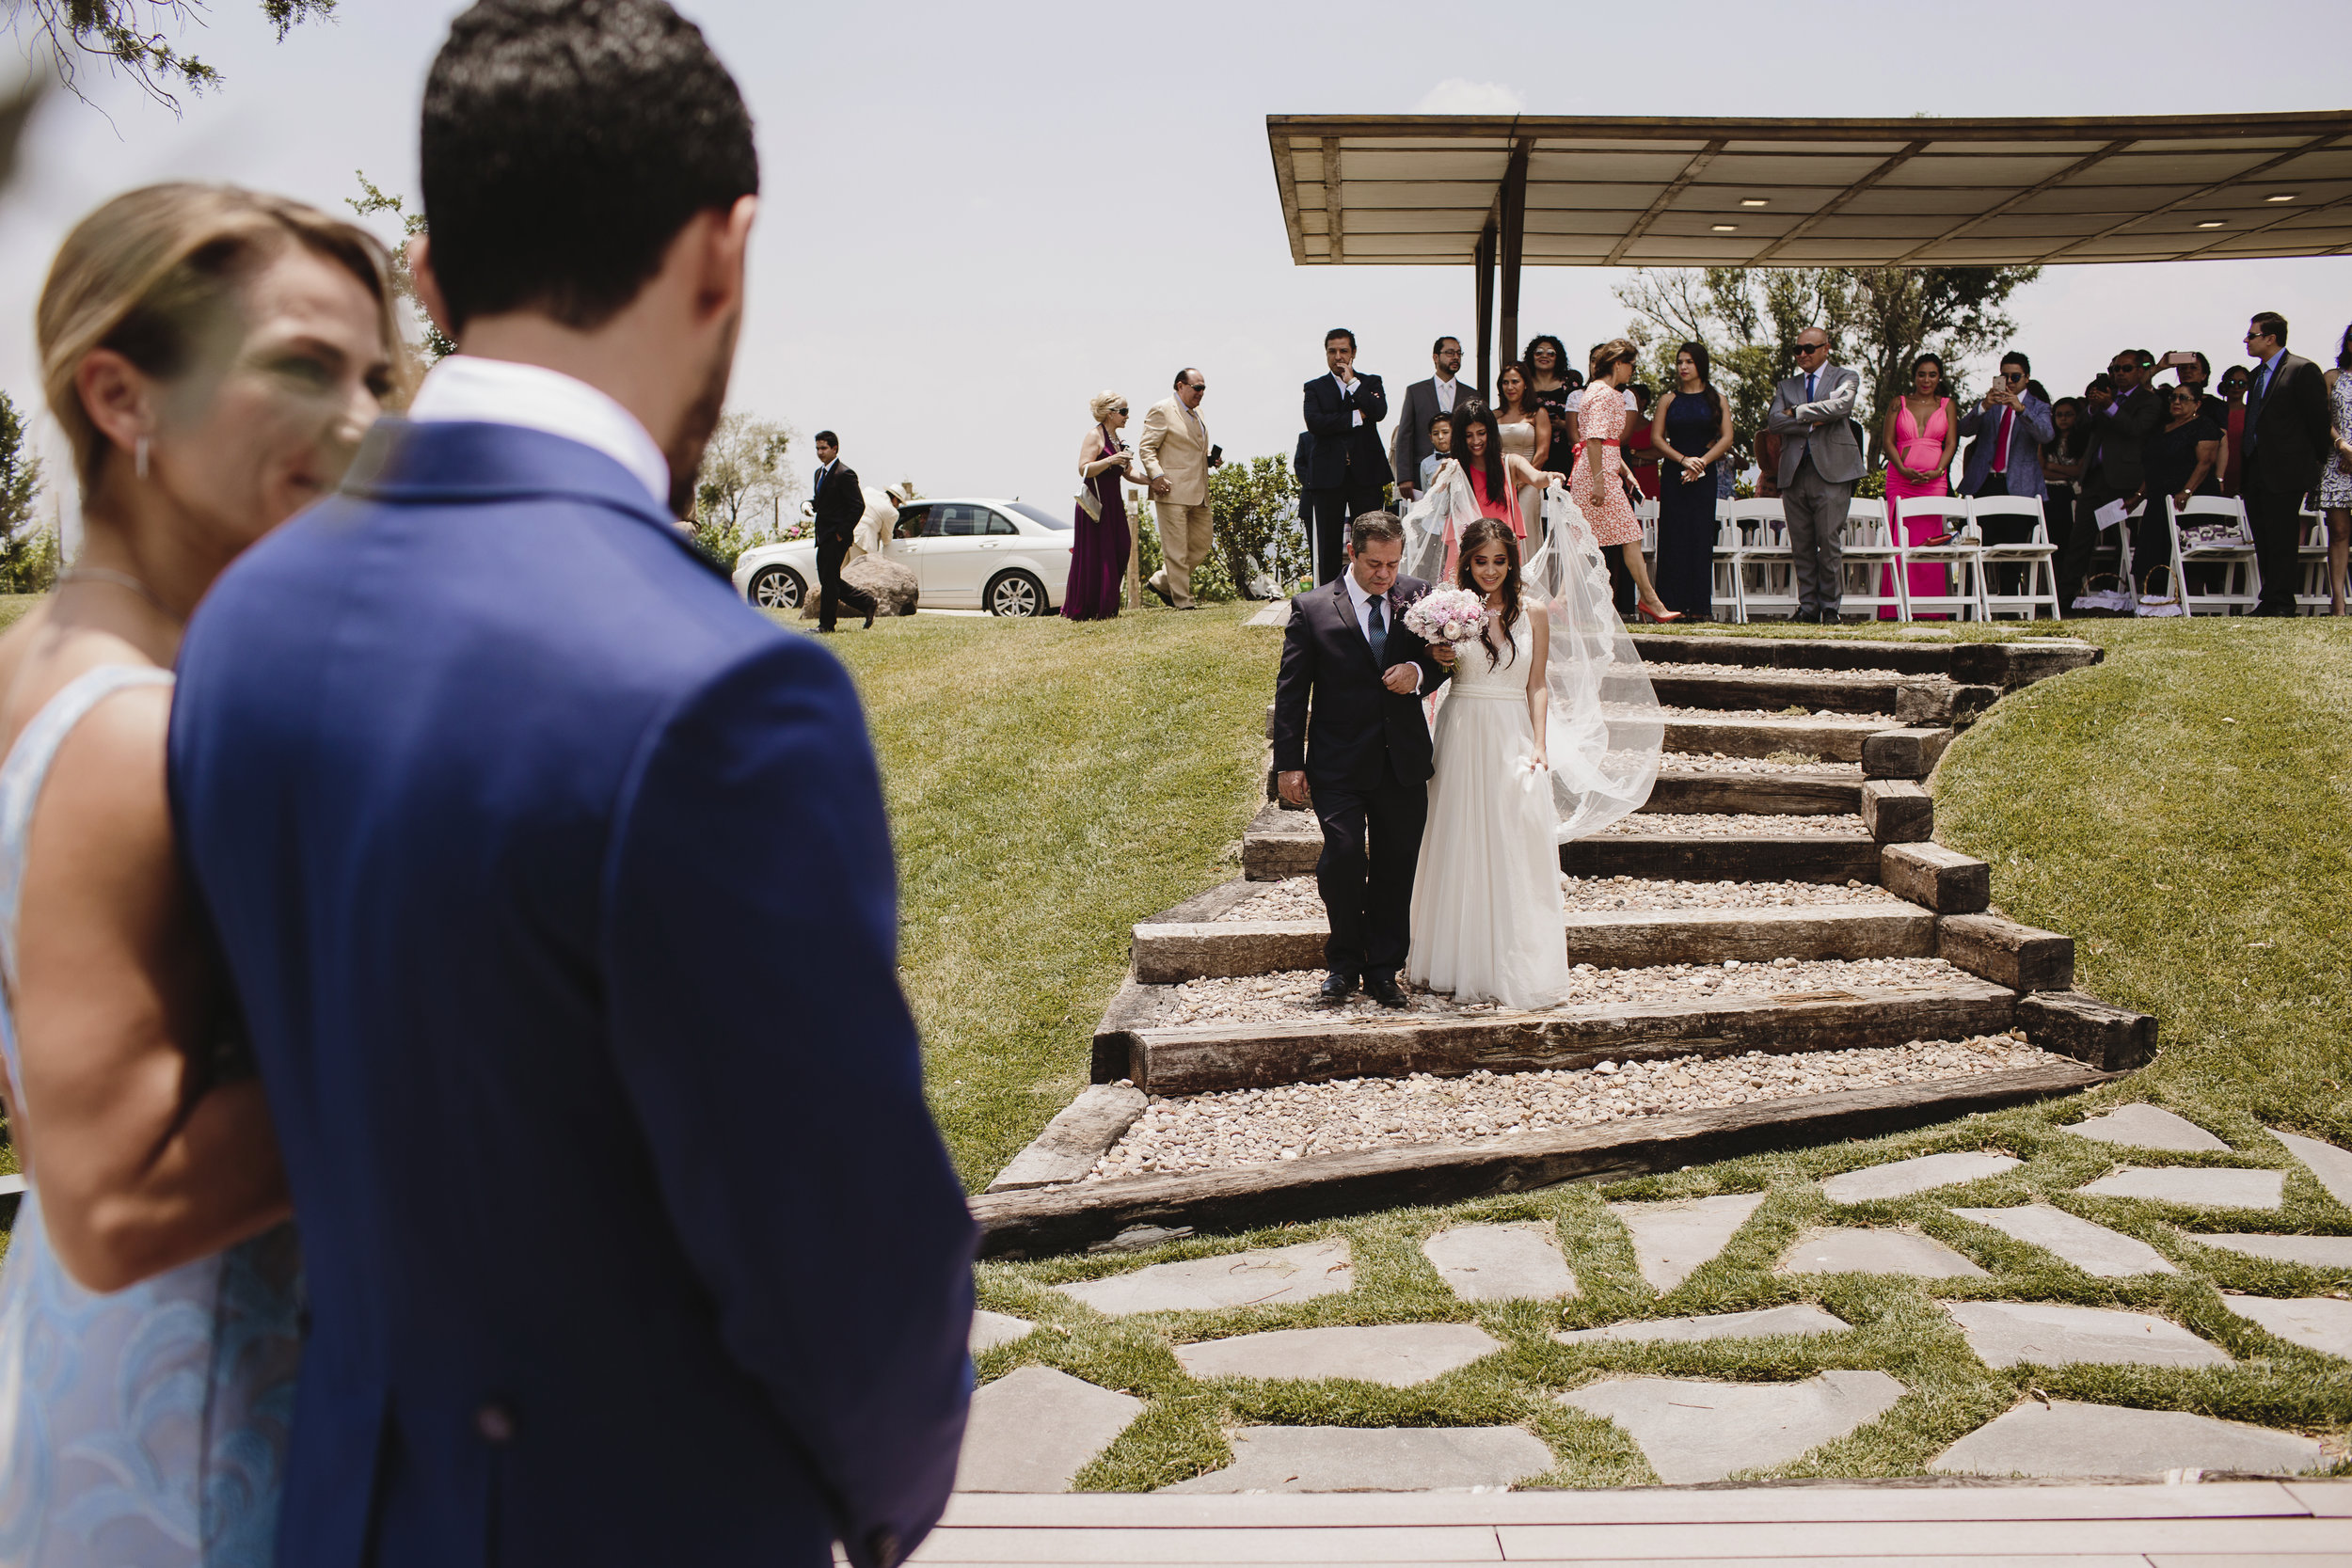 alfons_flores_destination_wedding_photography_mavi_david-878.JPG